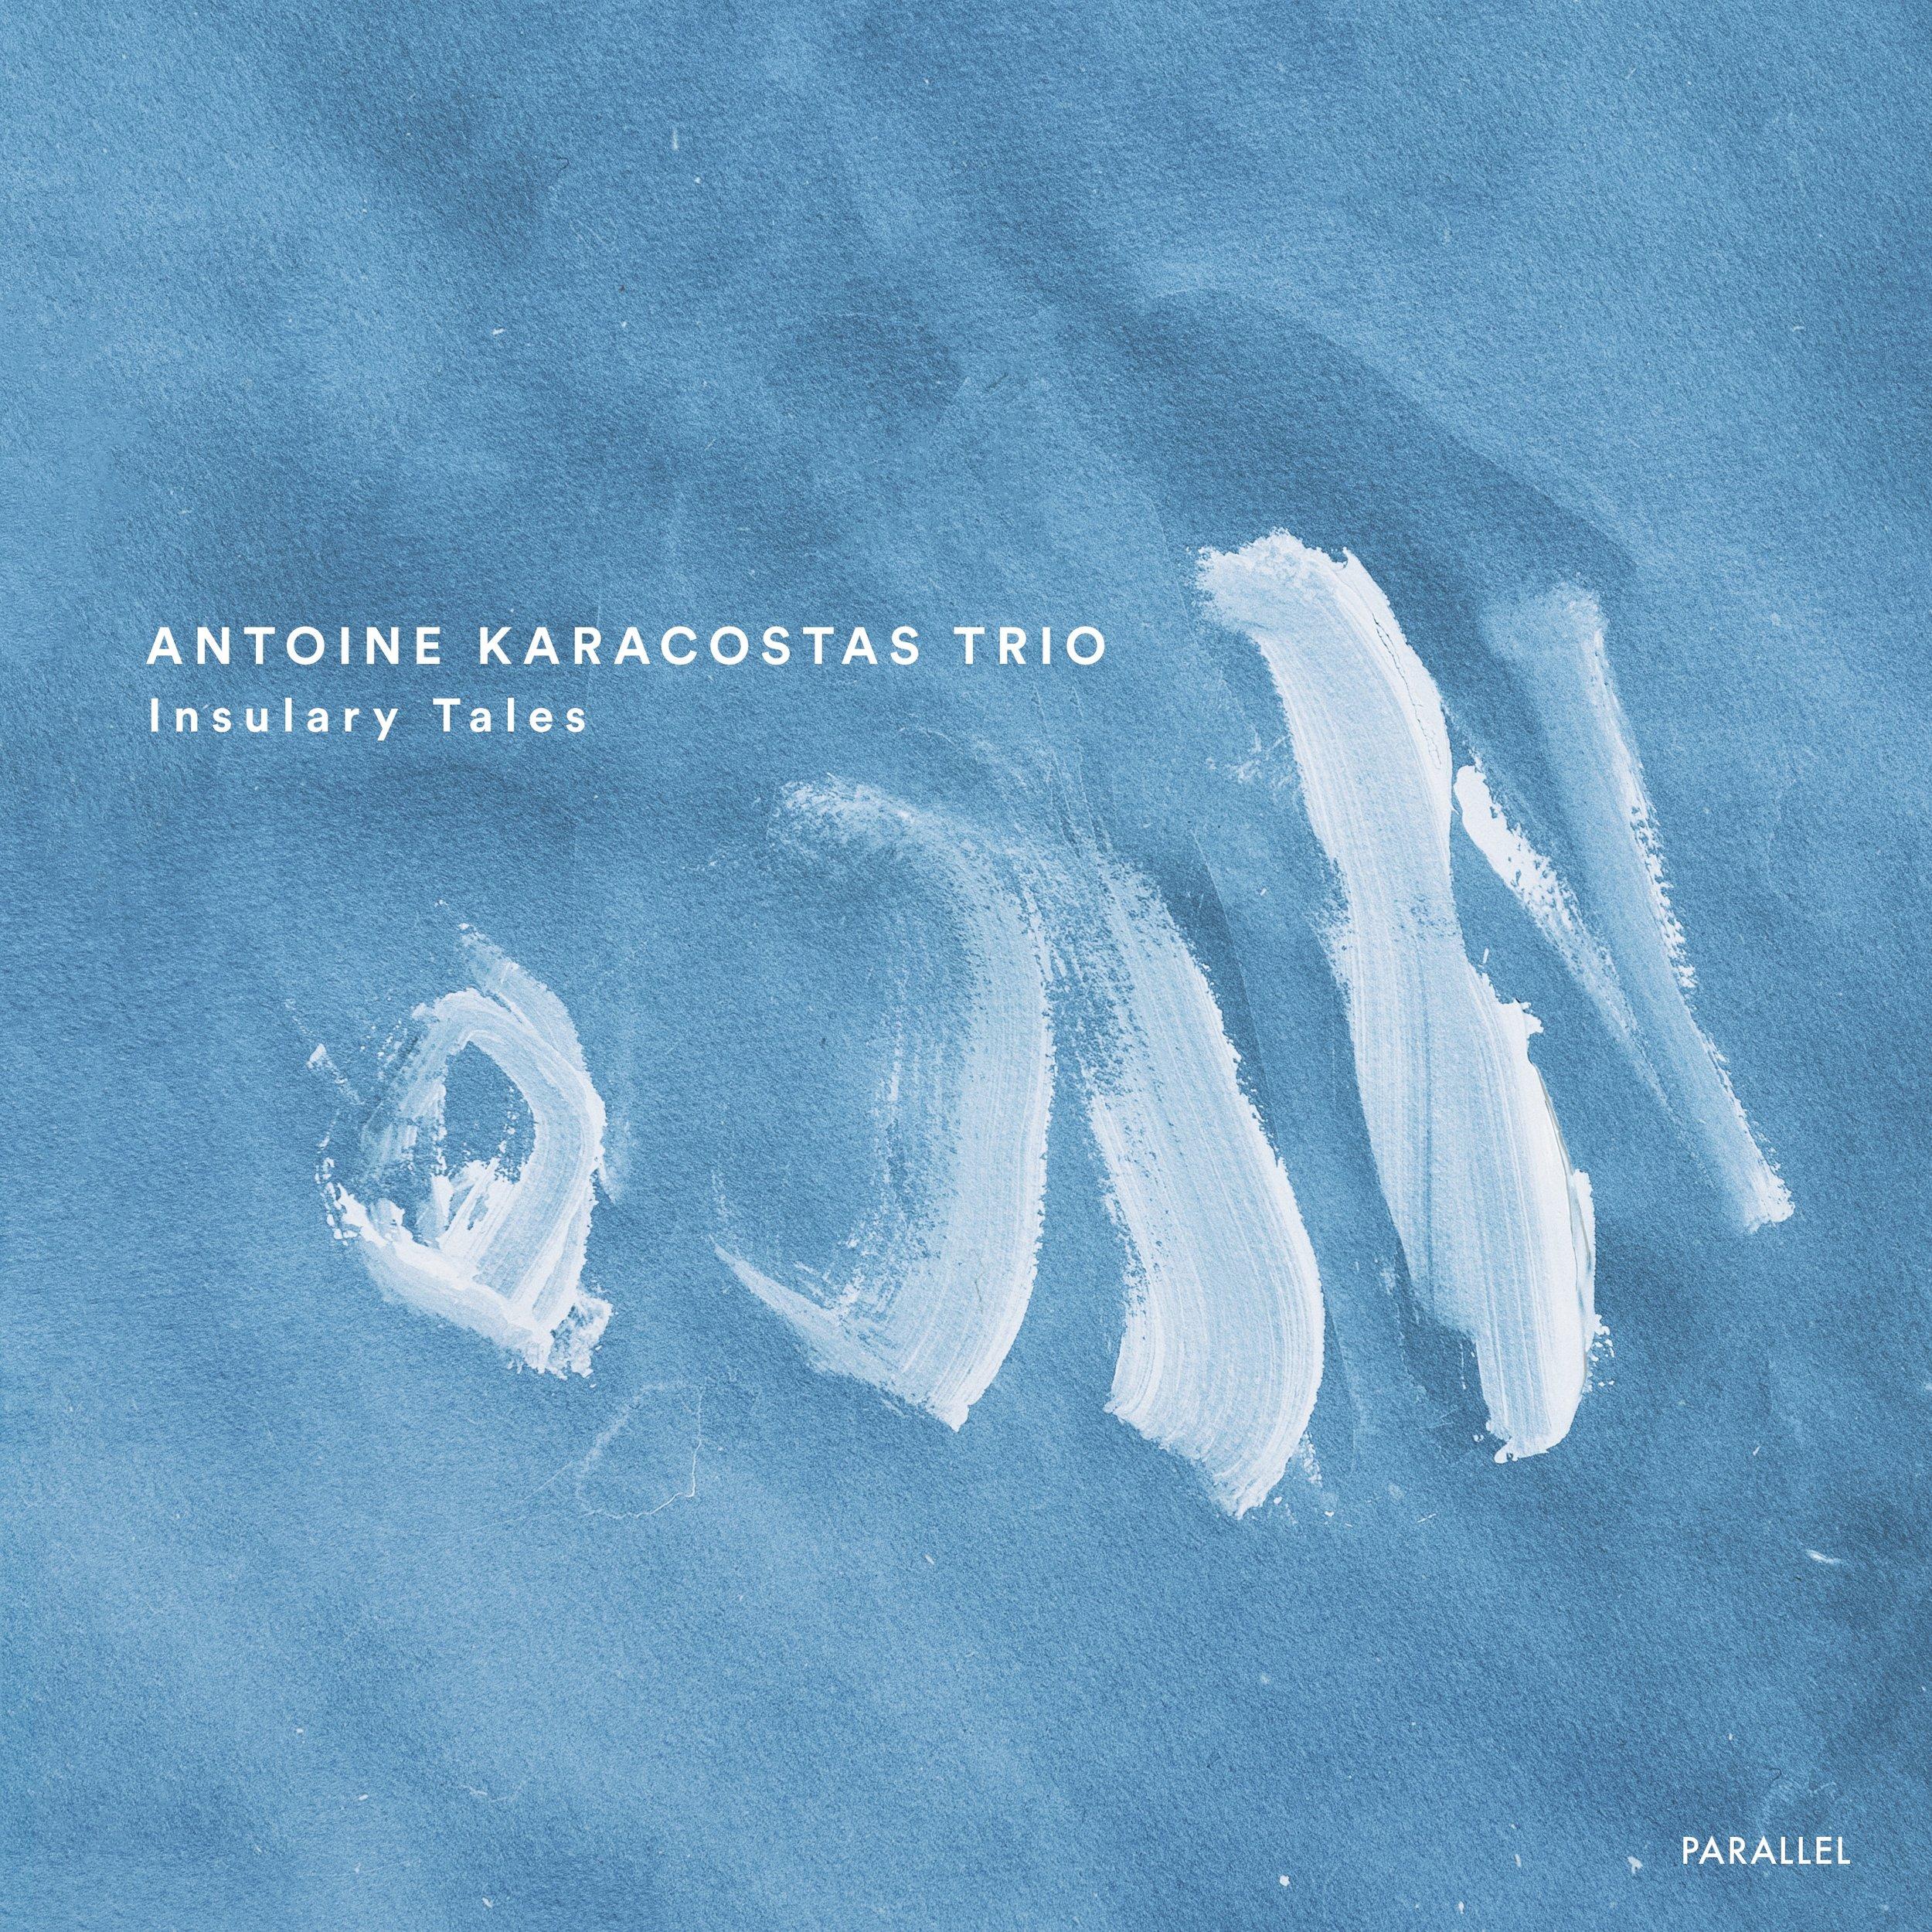 ANTOINE KARACOSTAS TRIO  - INSULARY TALES (2019)